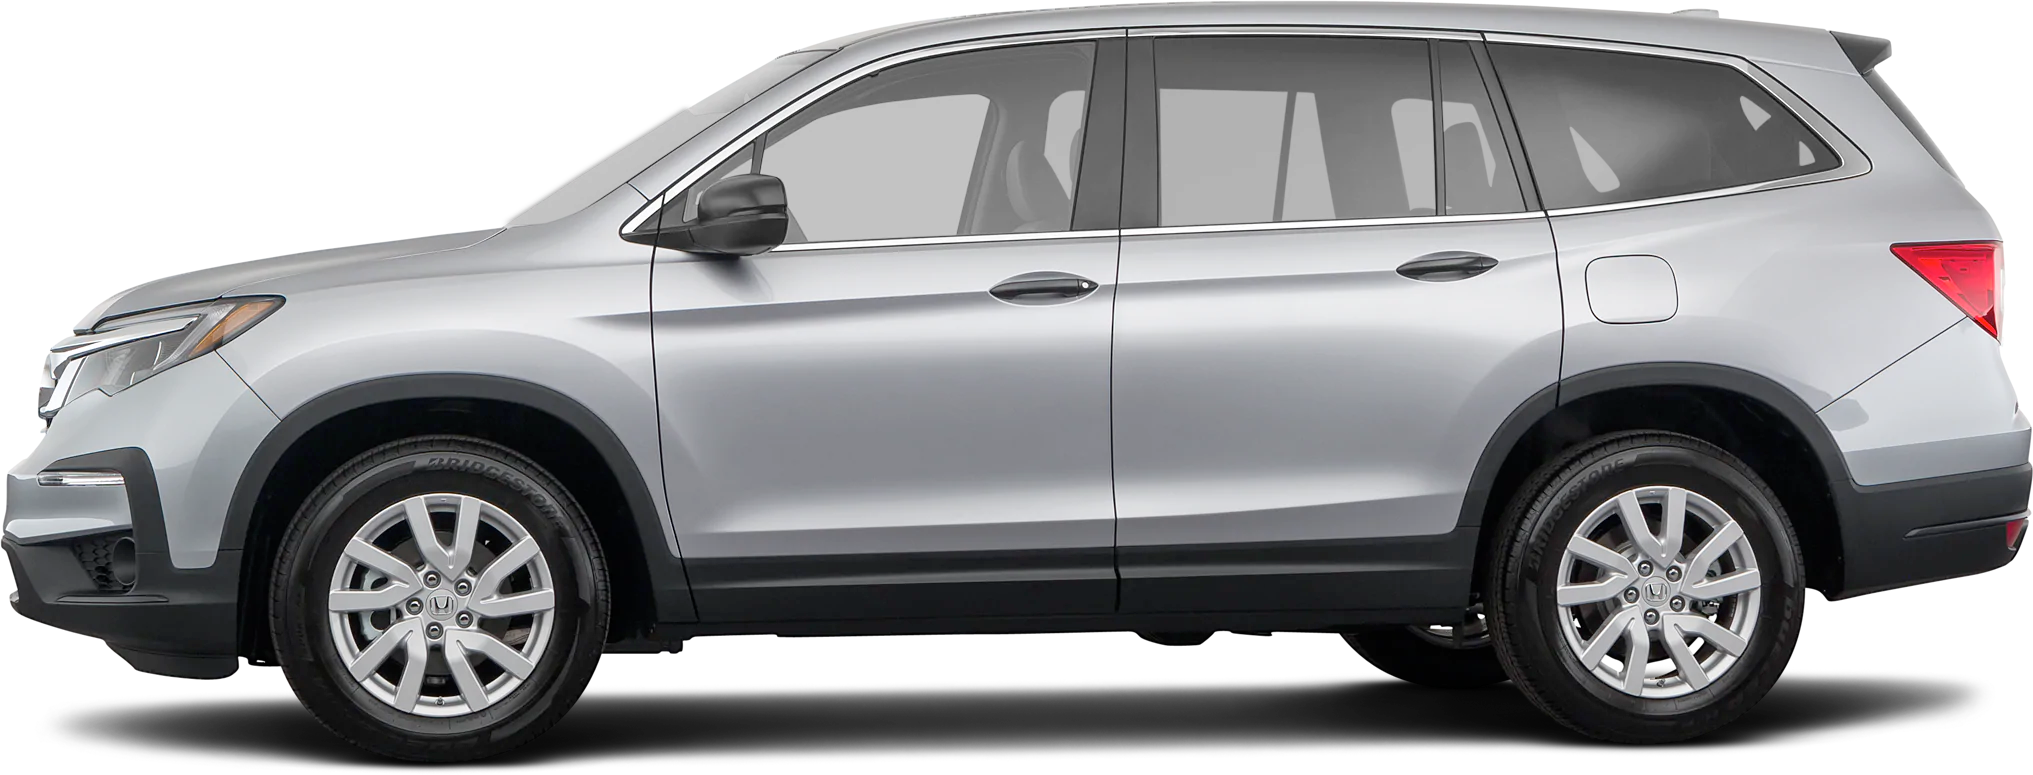 2020 Honda Pilot SUV LX AWD